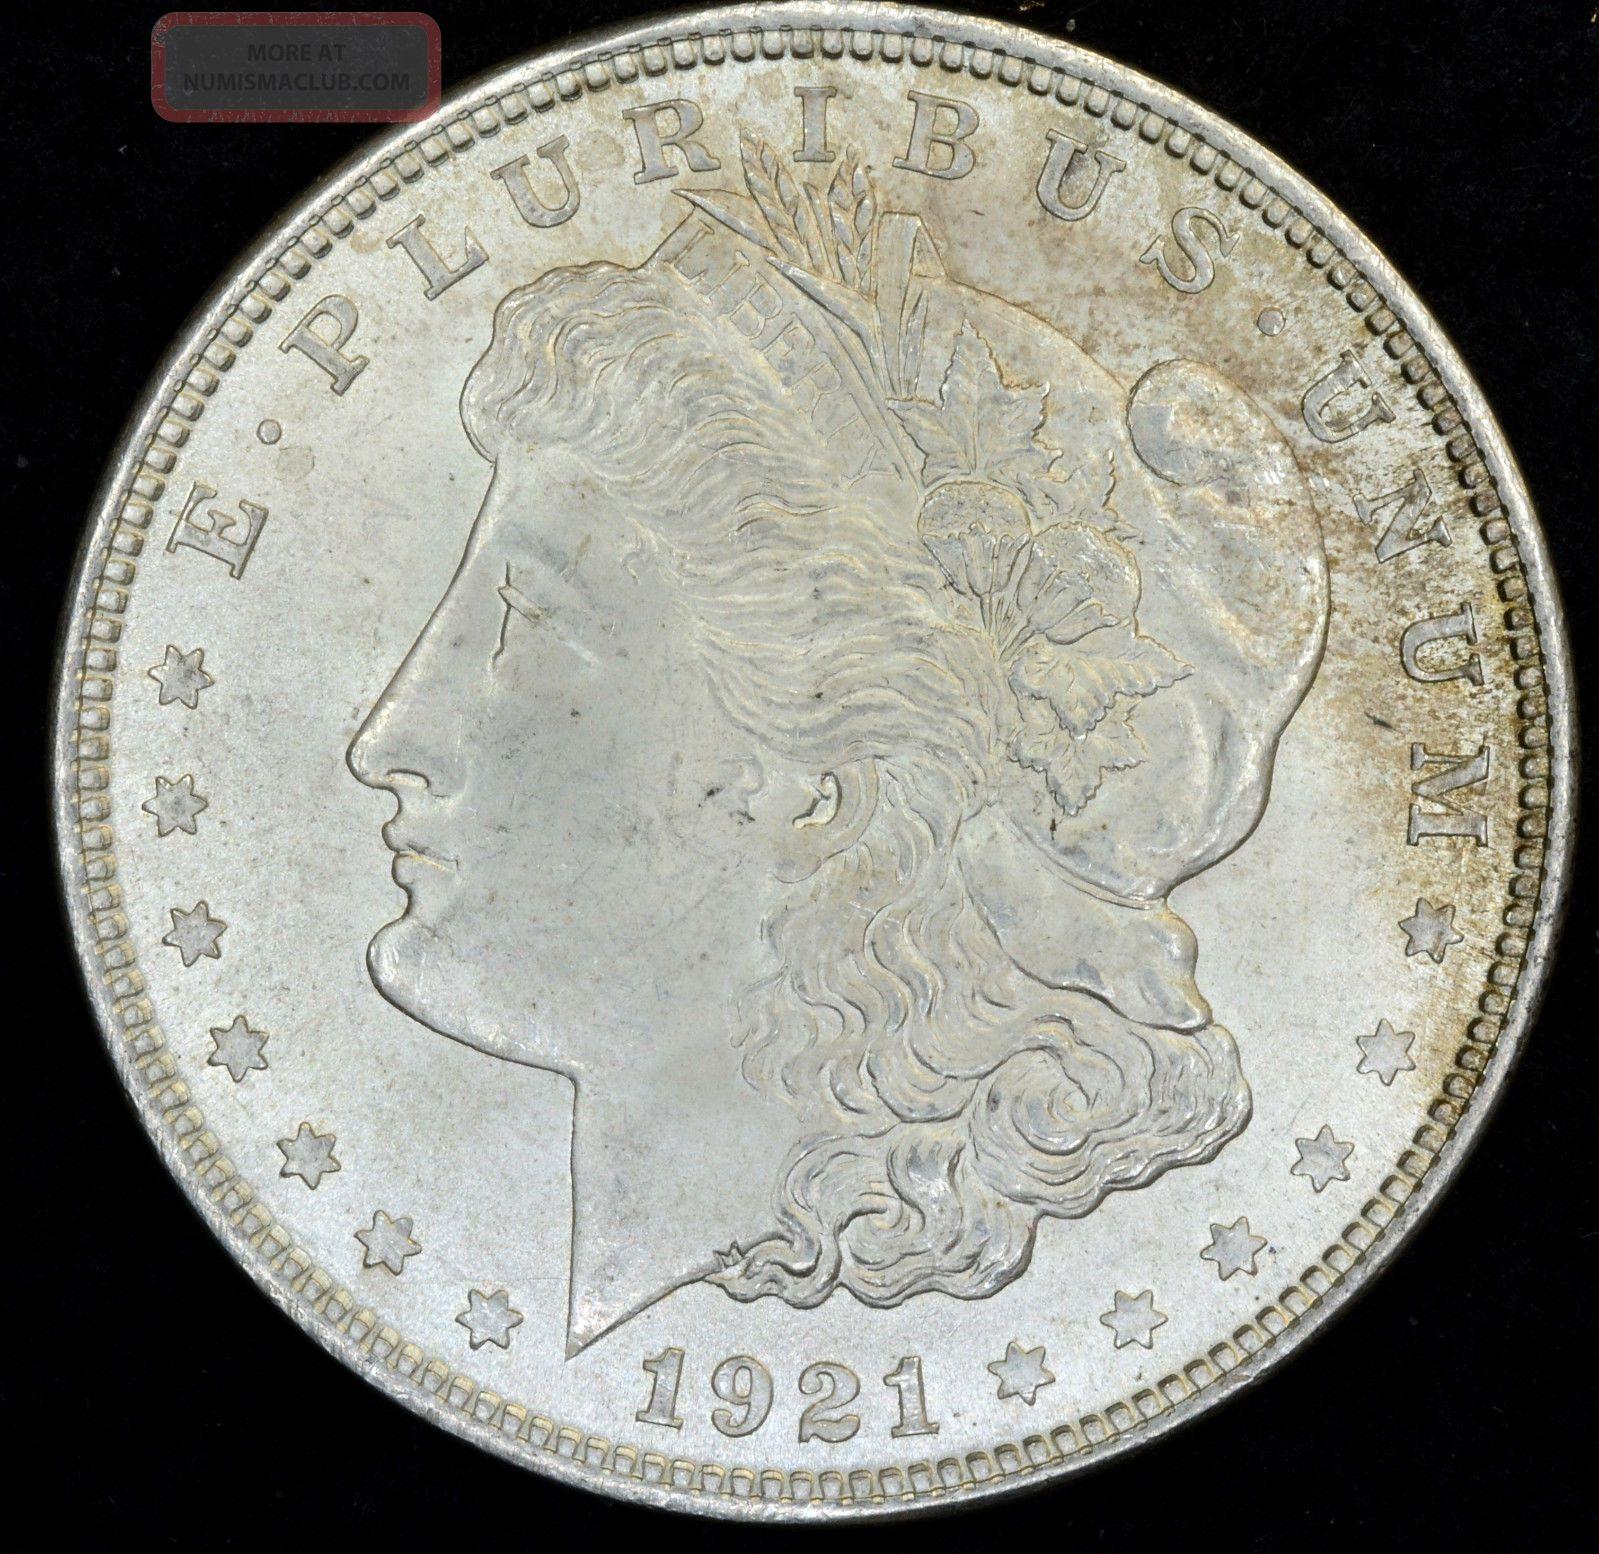 1921 1 Morgan Silver Dollar Unc With Toning 317